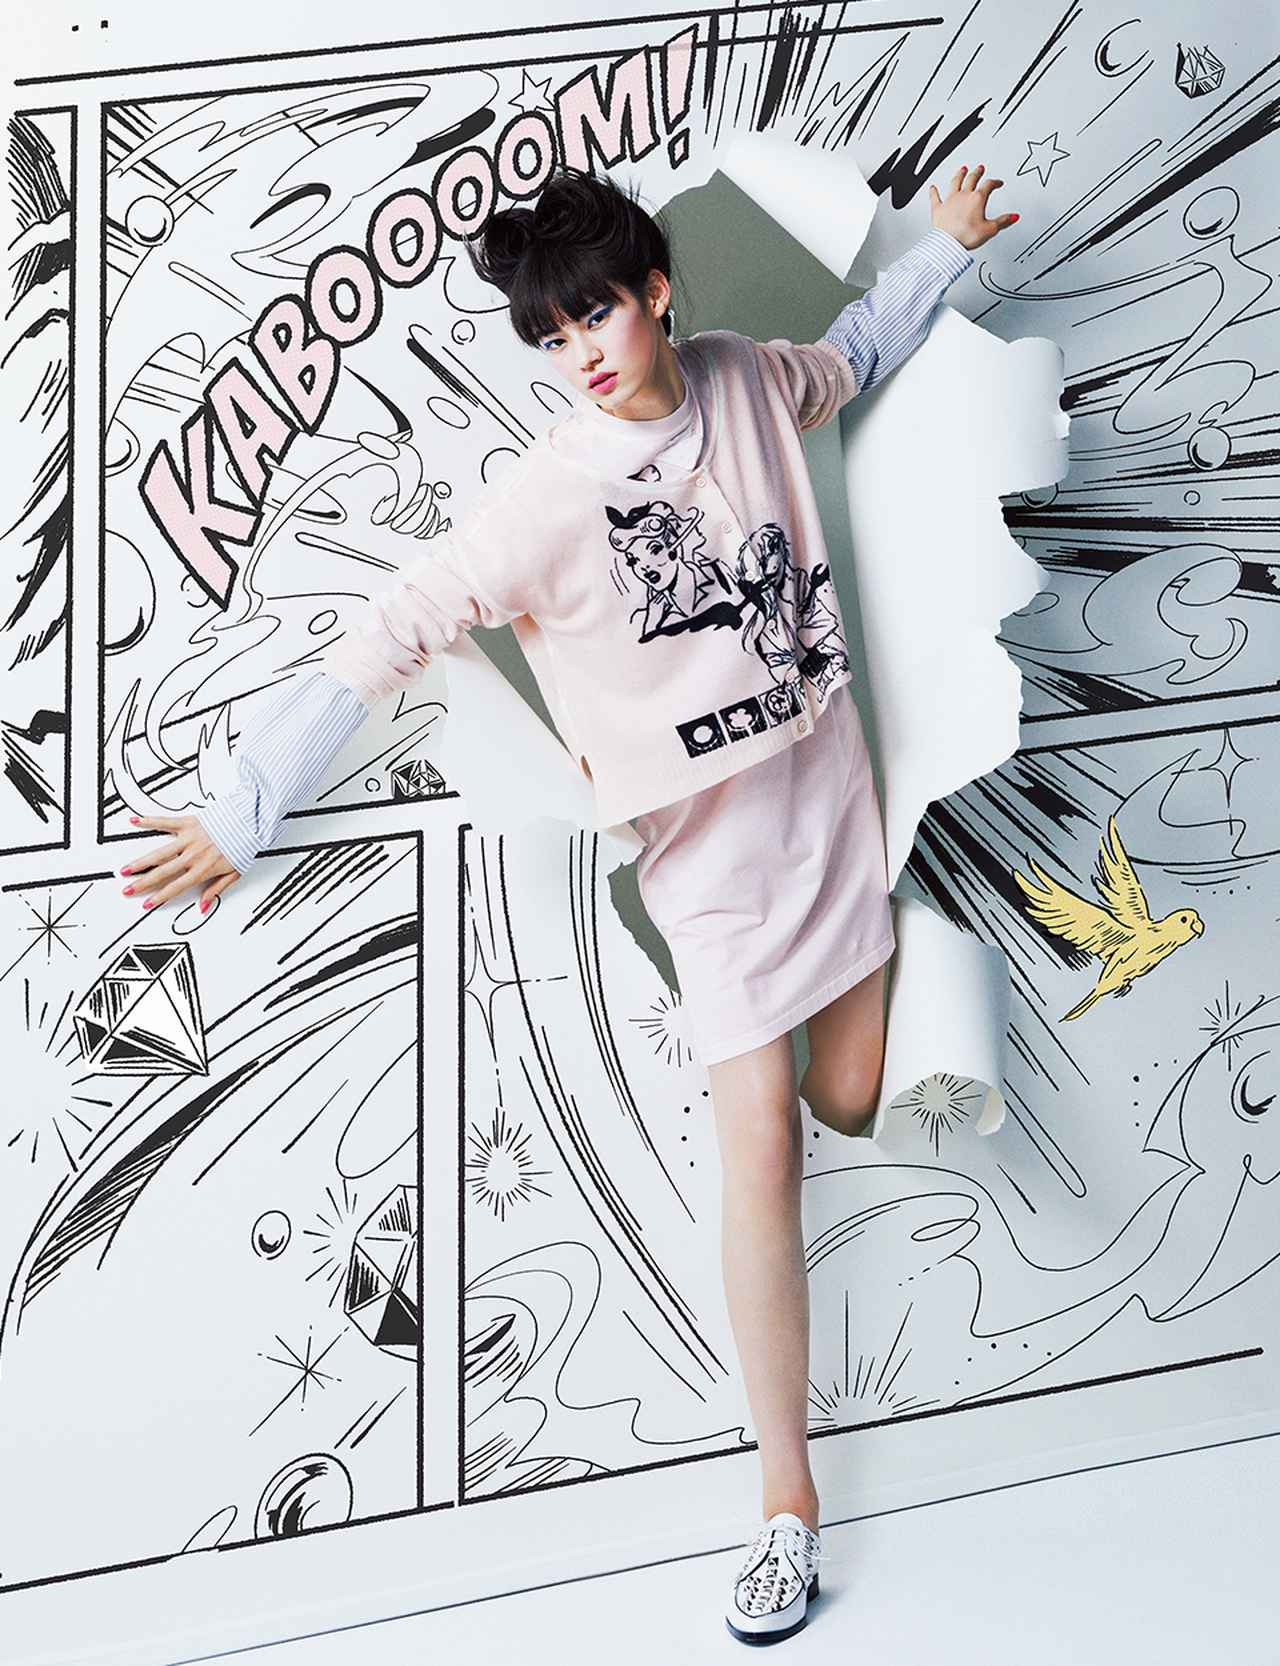 Images : 2番目の画像 - 「ファッションは愉快だ!」のアルバム - T JAPAN:The New York Times Style Magazine 公式サイト